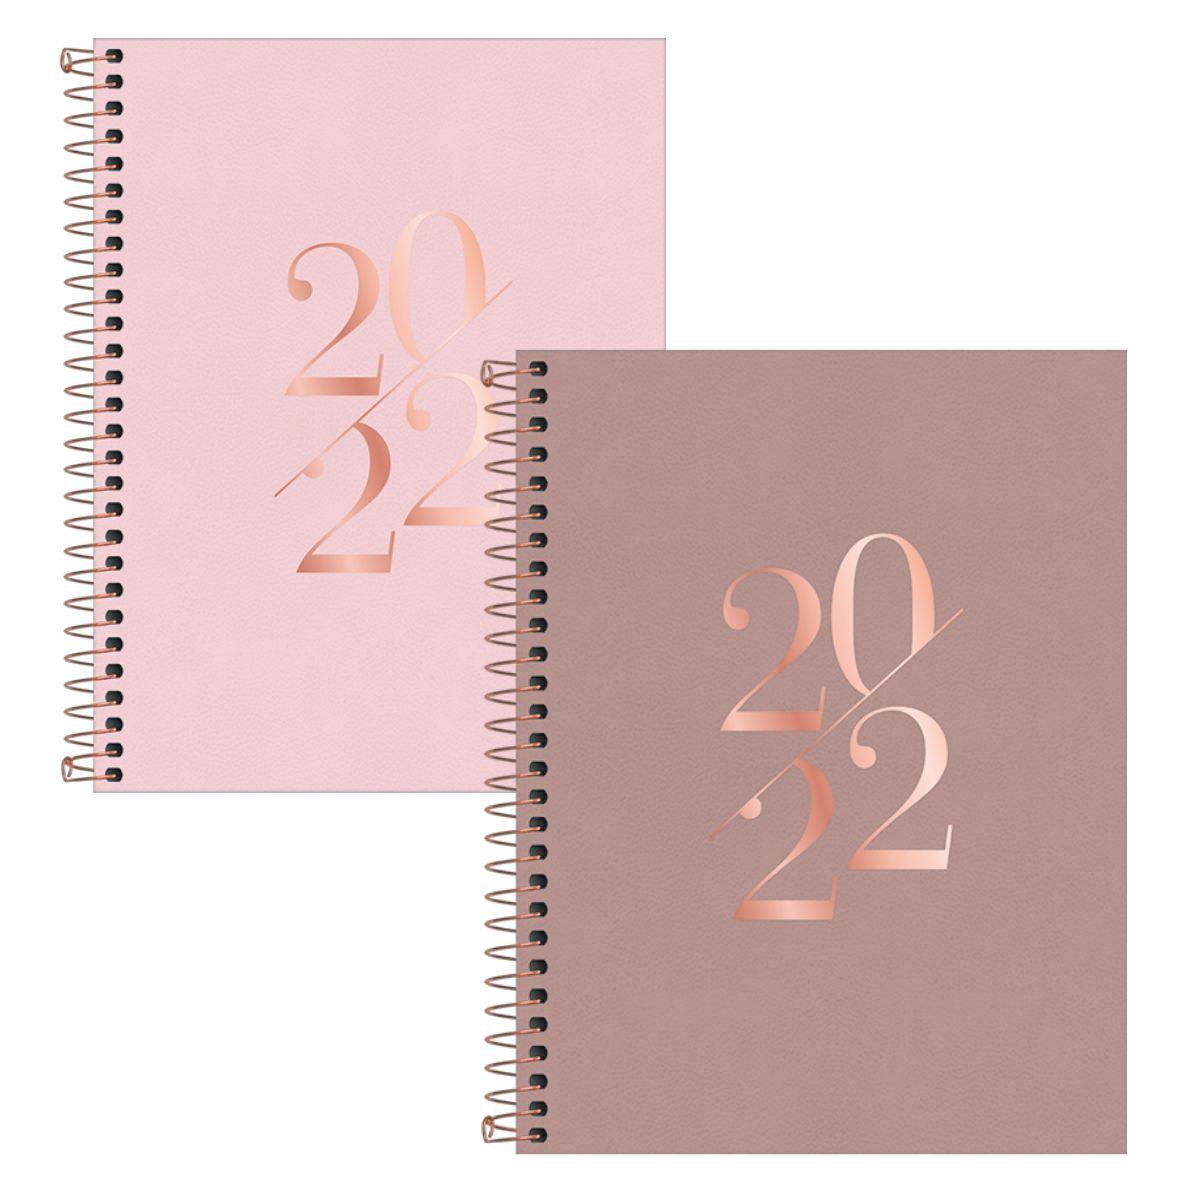 Agenda Planner 2022 Vanilla para anotações - Tilibra